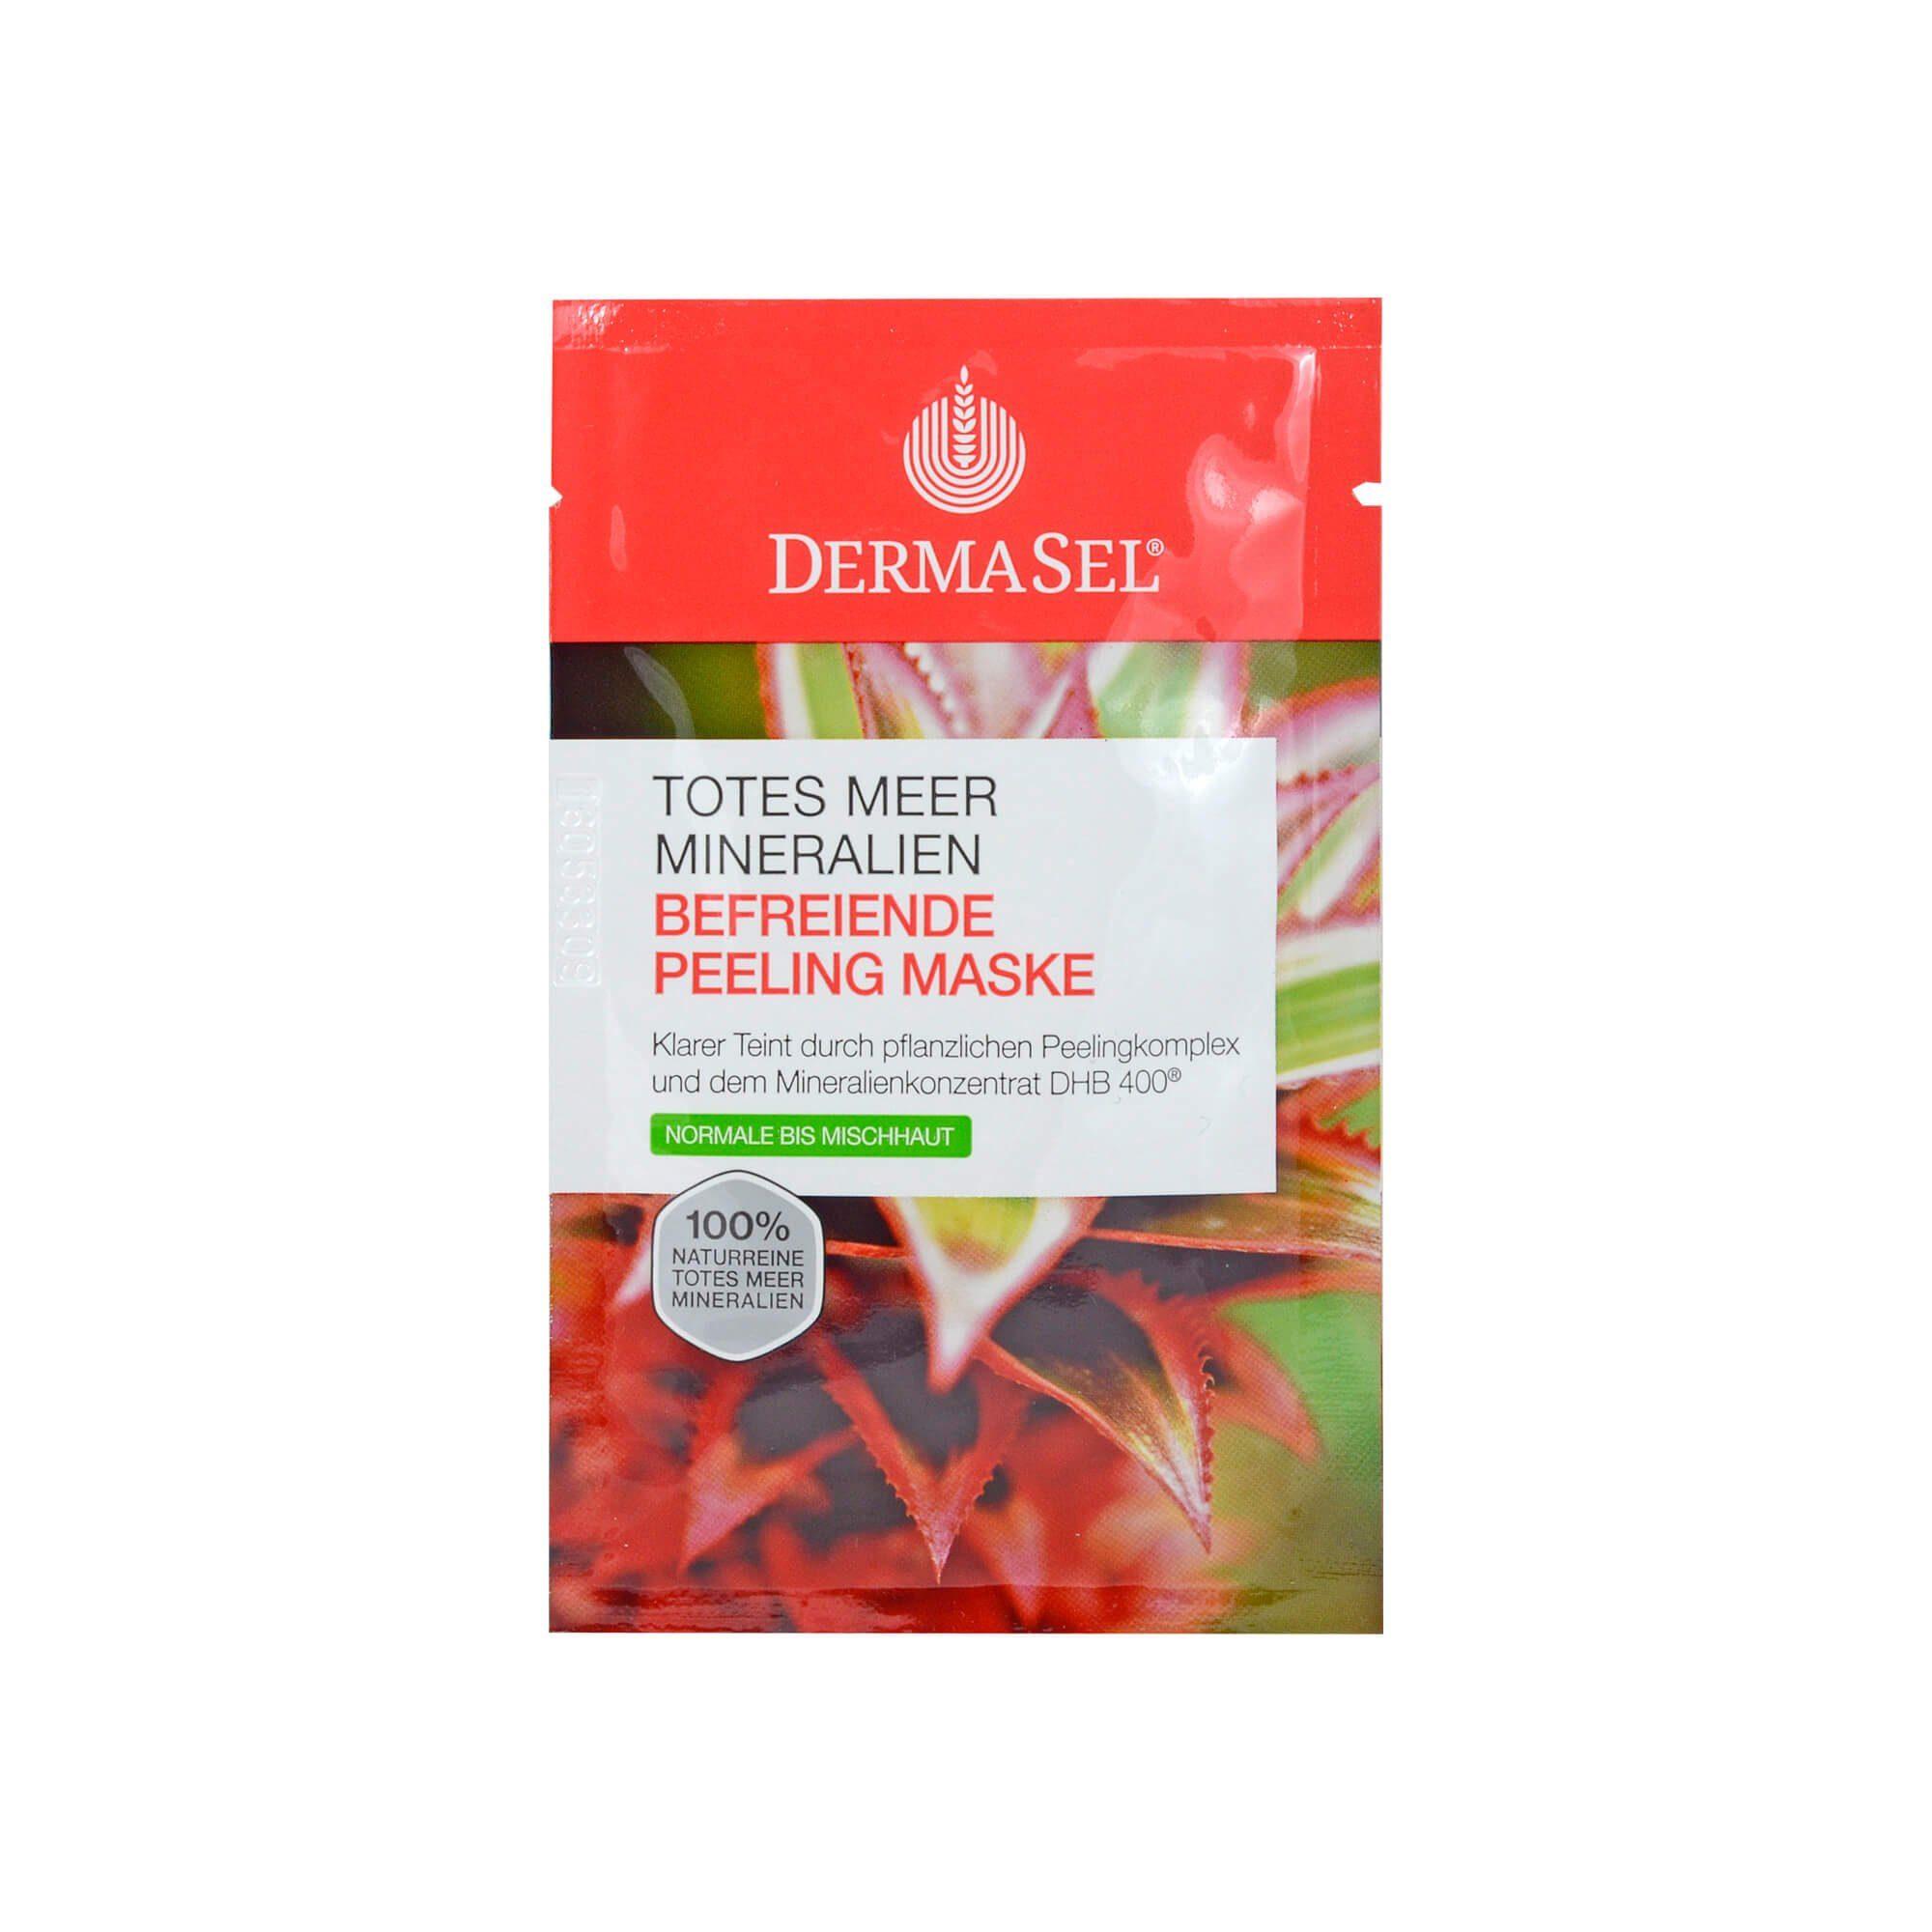 Dermasel Dermasel Peeling Maske , 12 ml